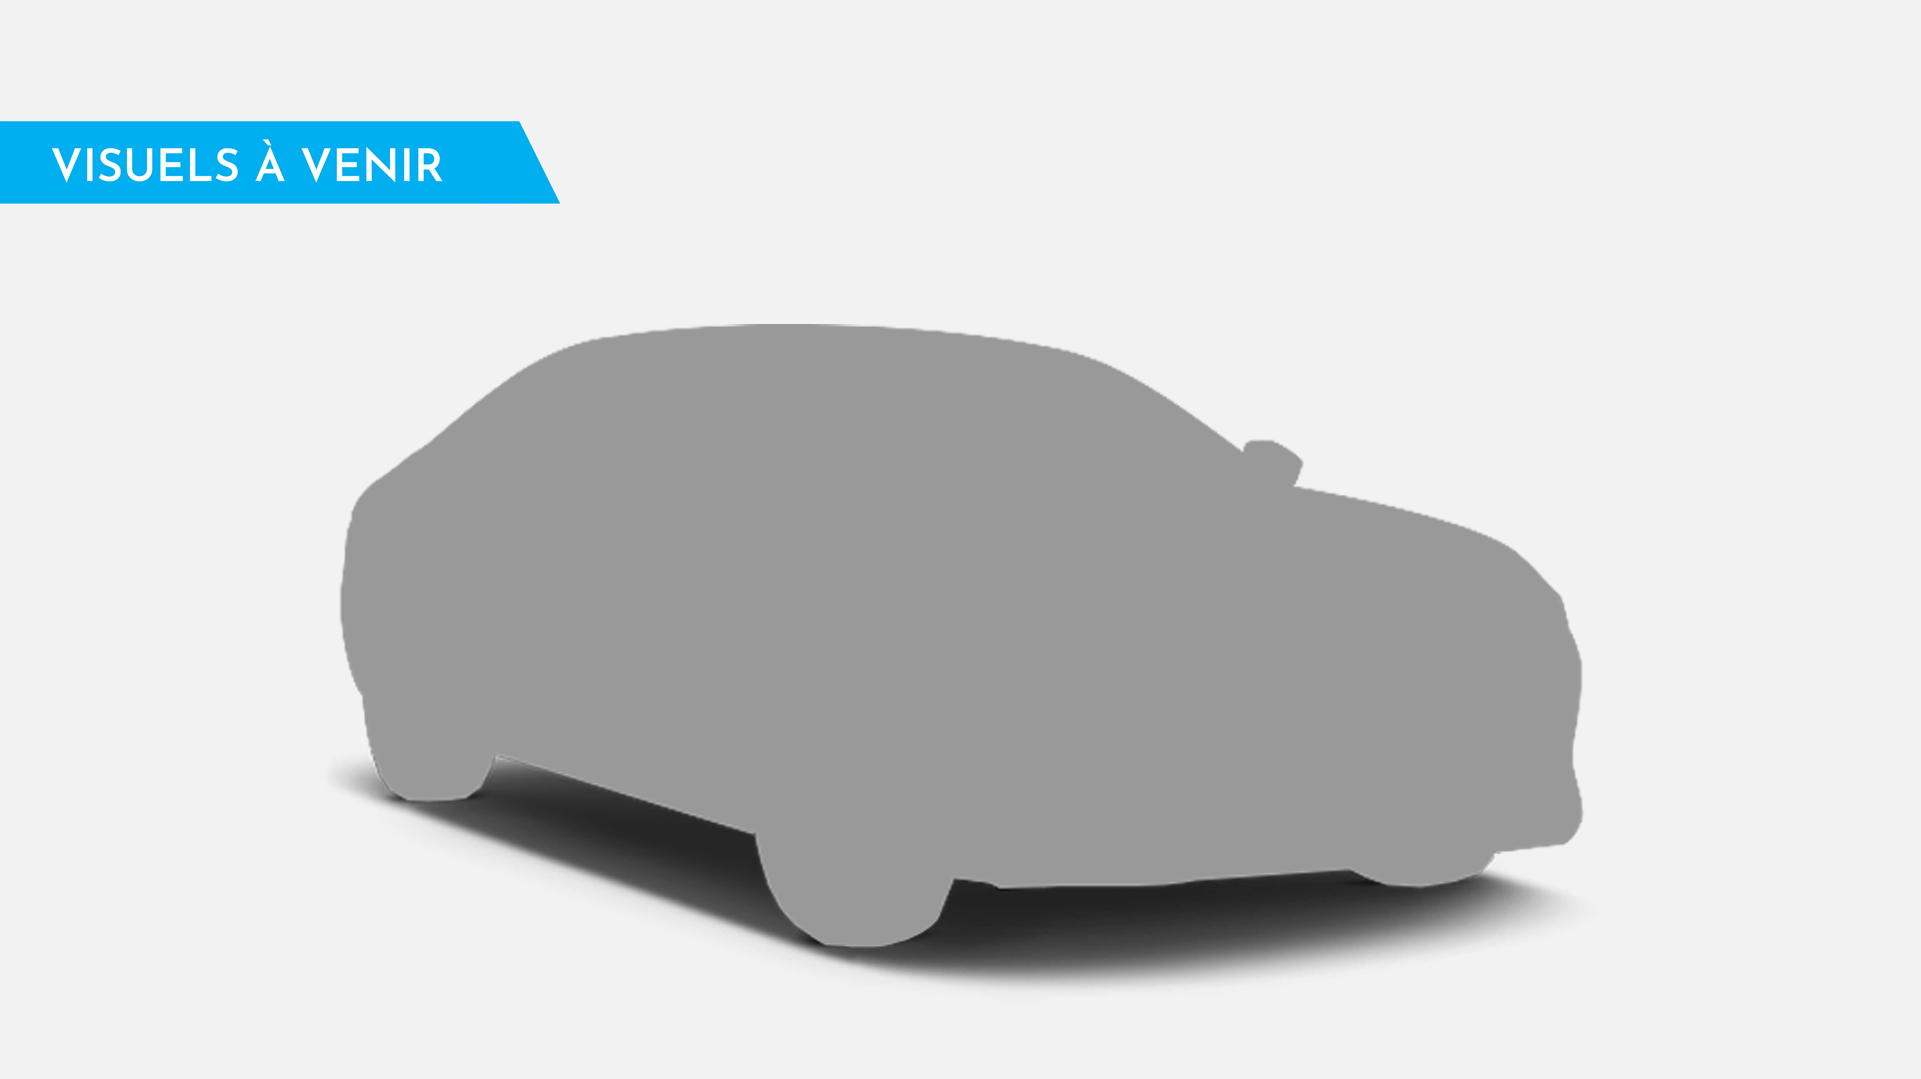 Hyundai tucson 1 7 crdi 115ch creative 2wd occasion lyon for Interieur hyundai tucson